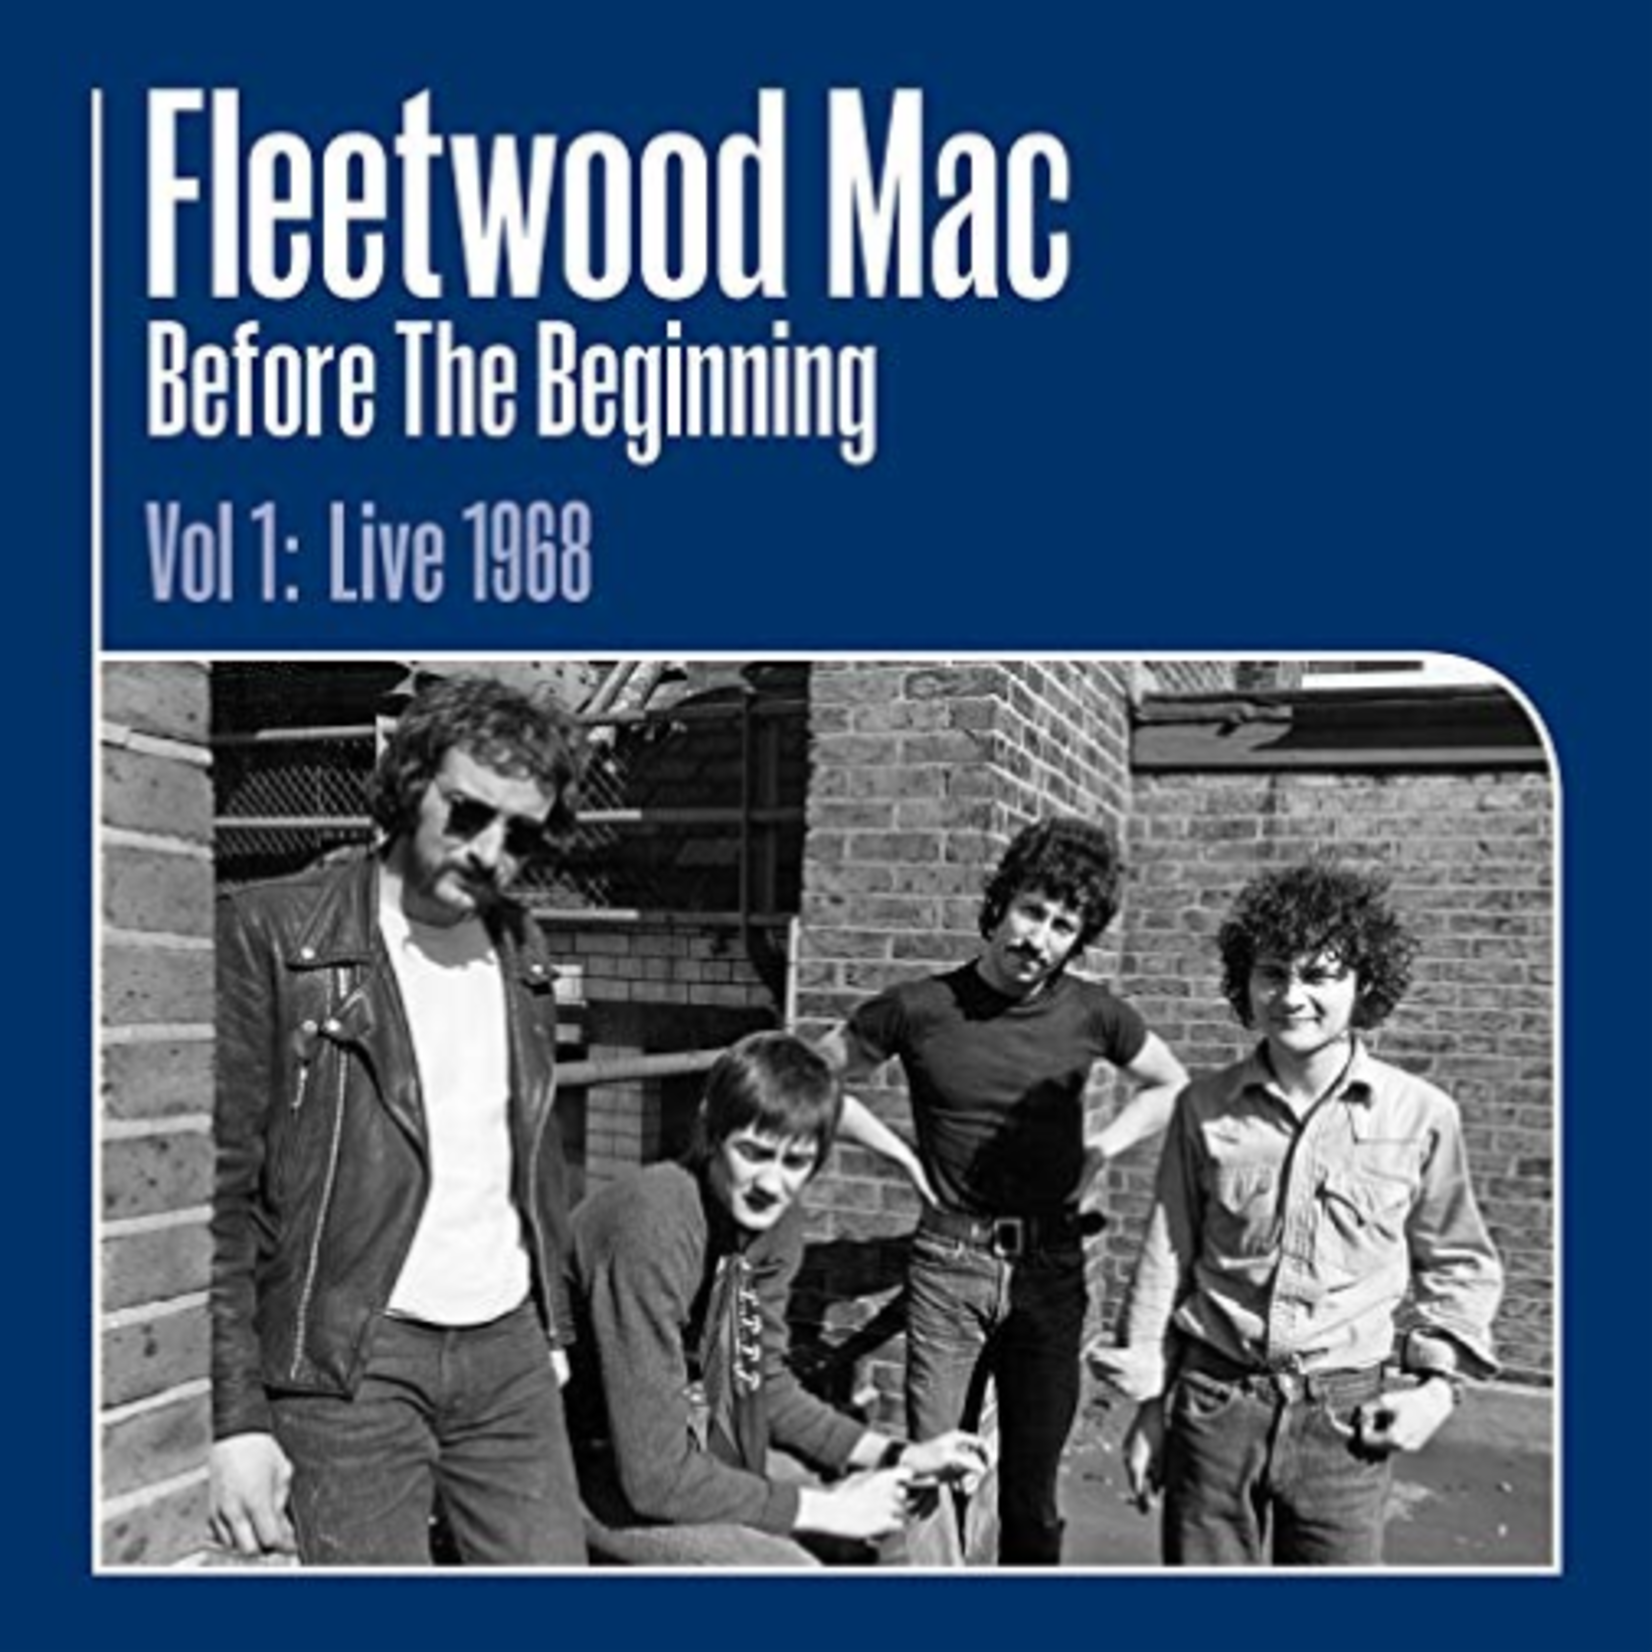 FLEETWOOD MAC BEFORE THE BEGINNING VOL 1: LIVE 1968